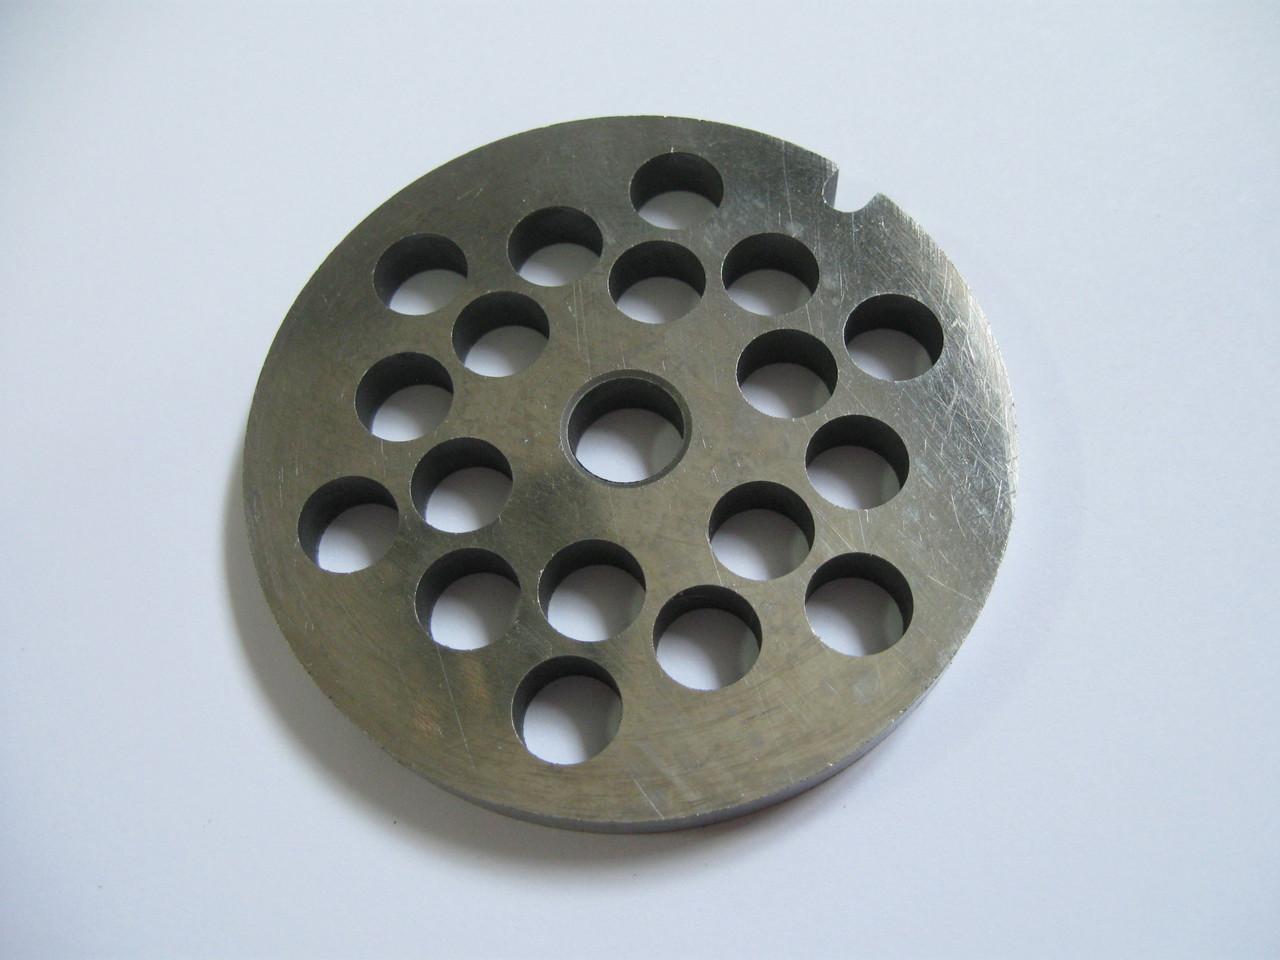 Сеточка для мясорубки Zelmer № 8, 8 мм 00755475